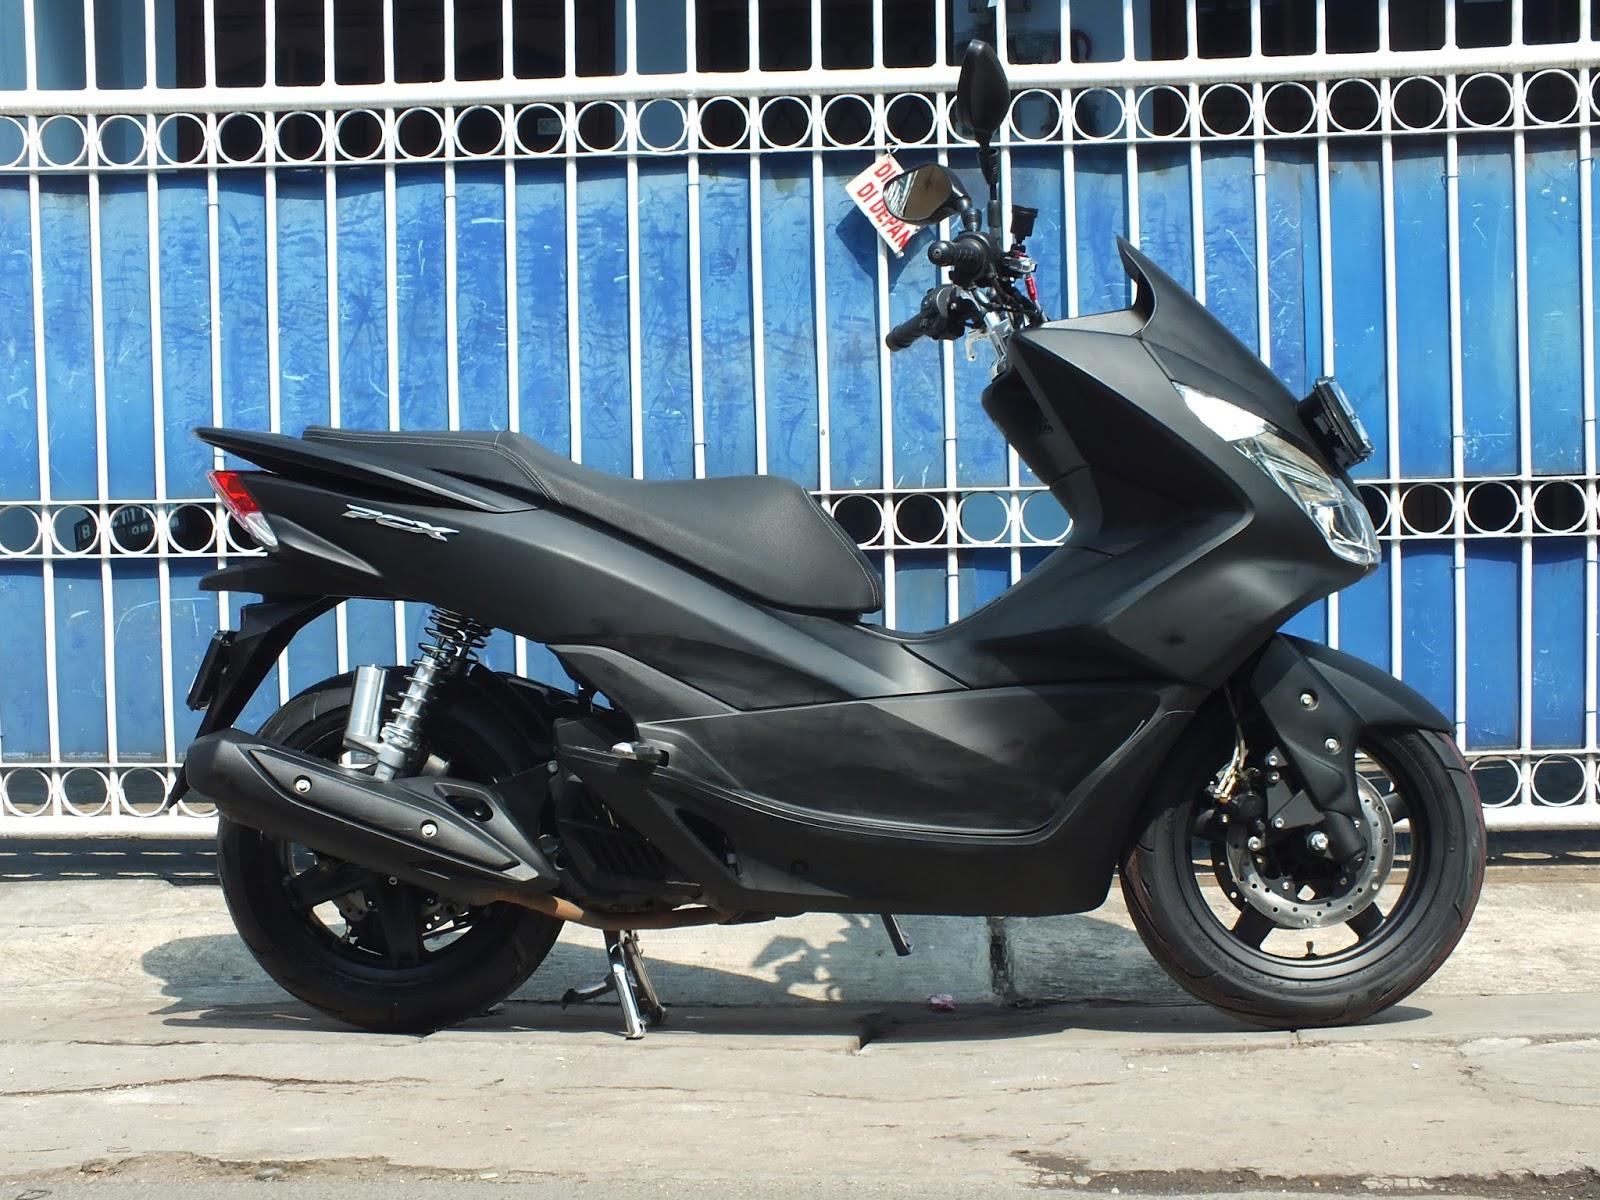 Bengkel Modifikasi Motor Honda Pcx OTOMOTIF